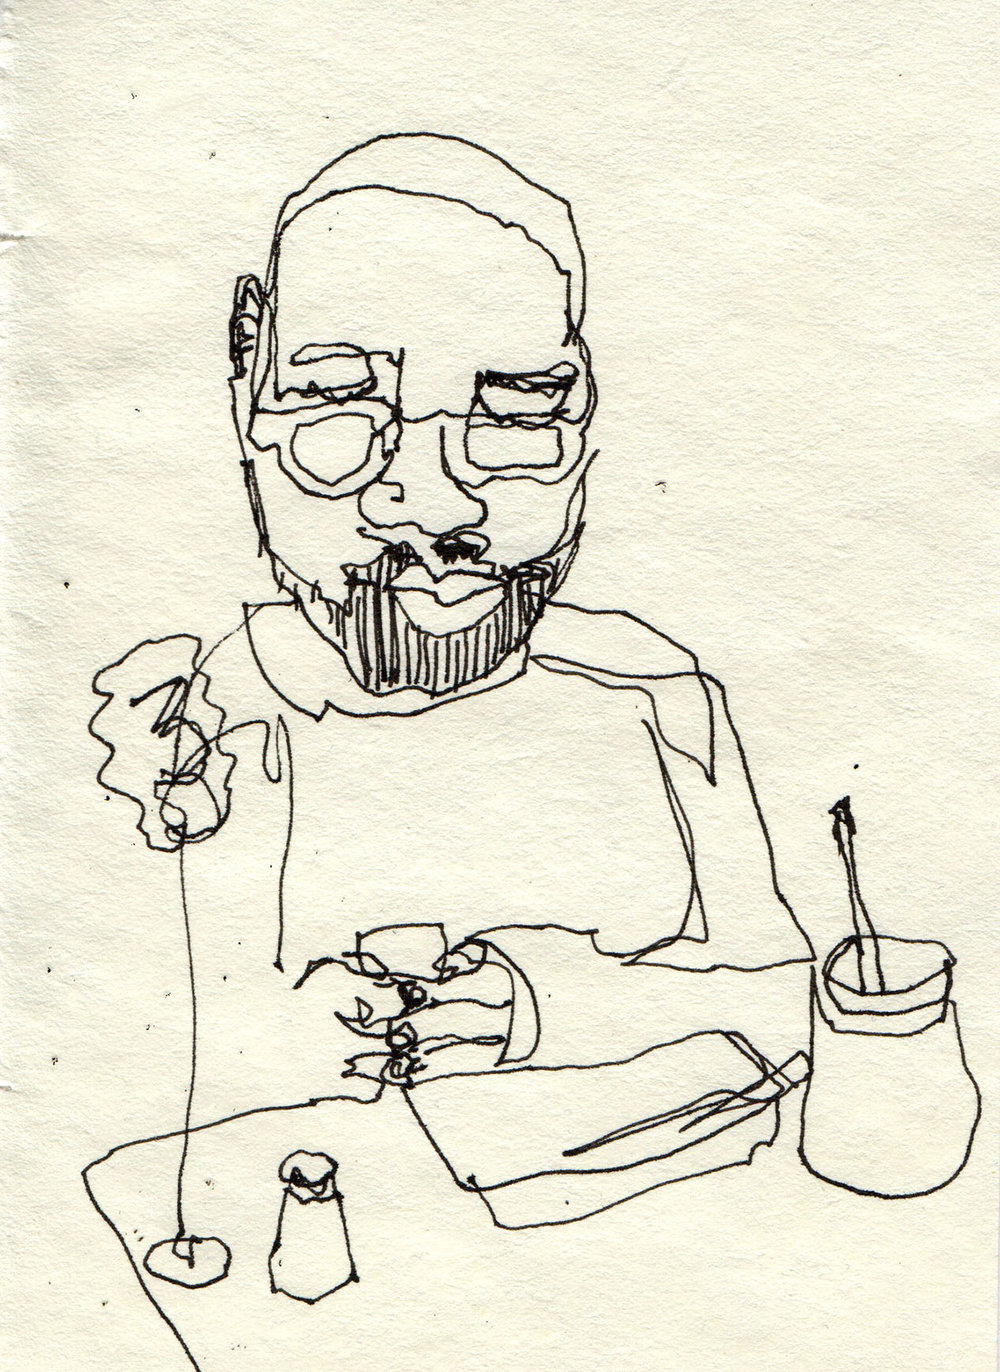 Whiten_New York dude_drawing_illustration.jpeg